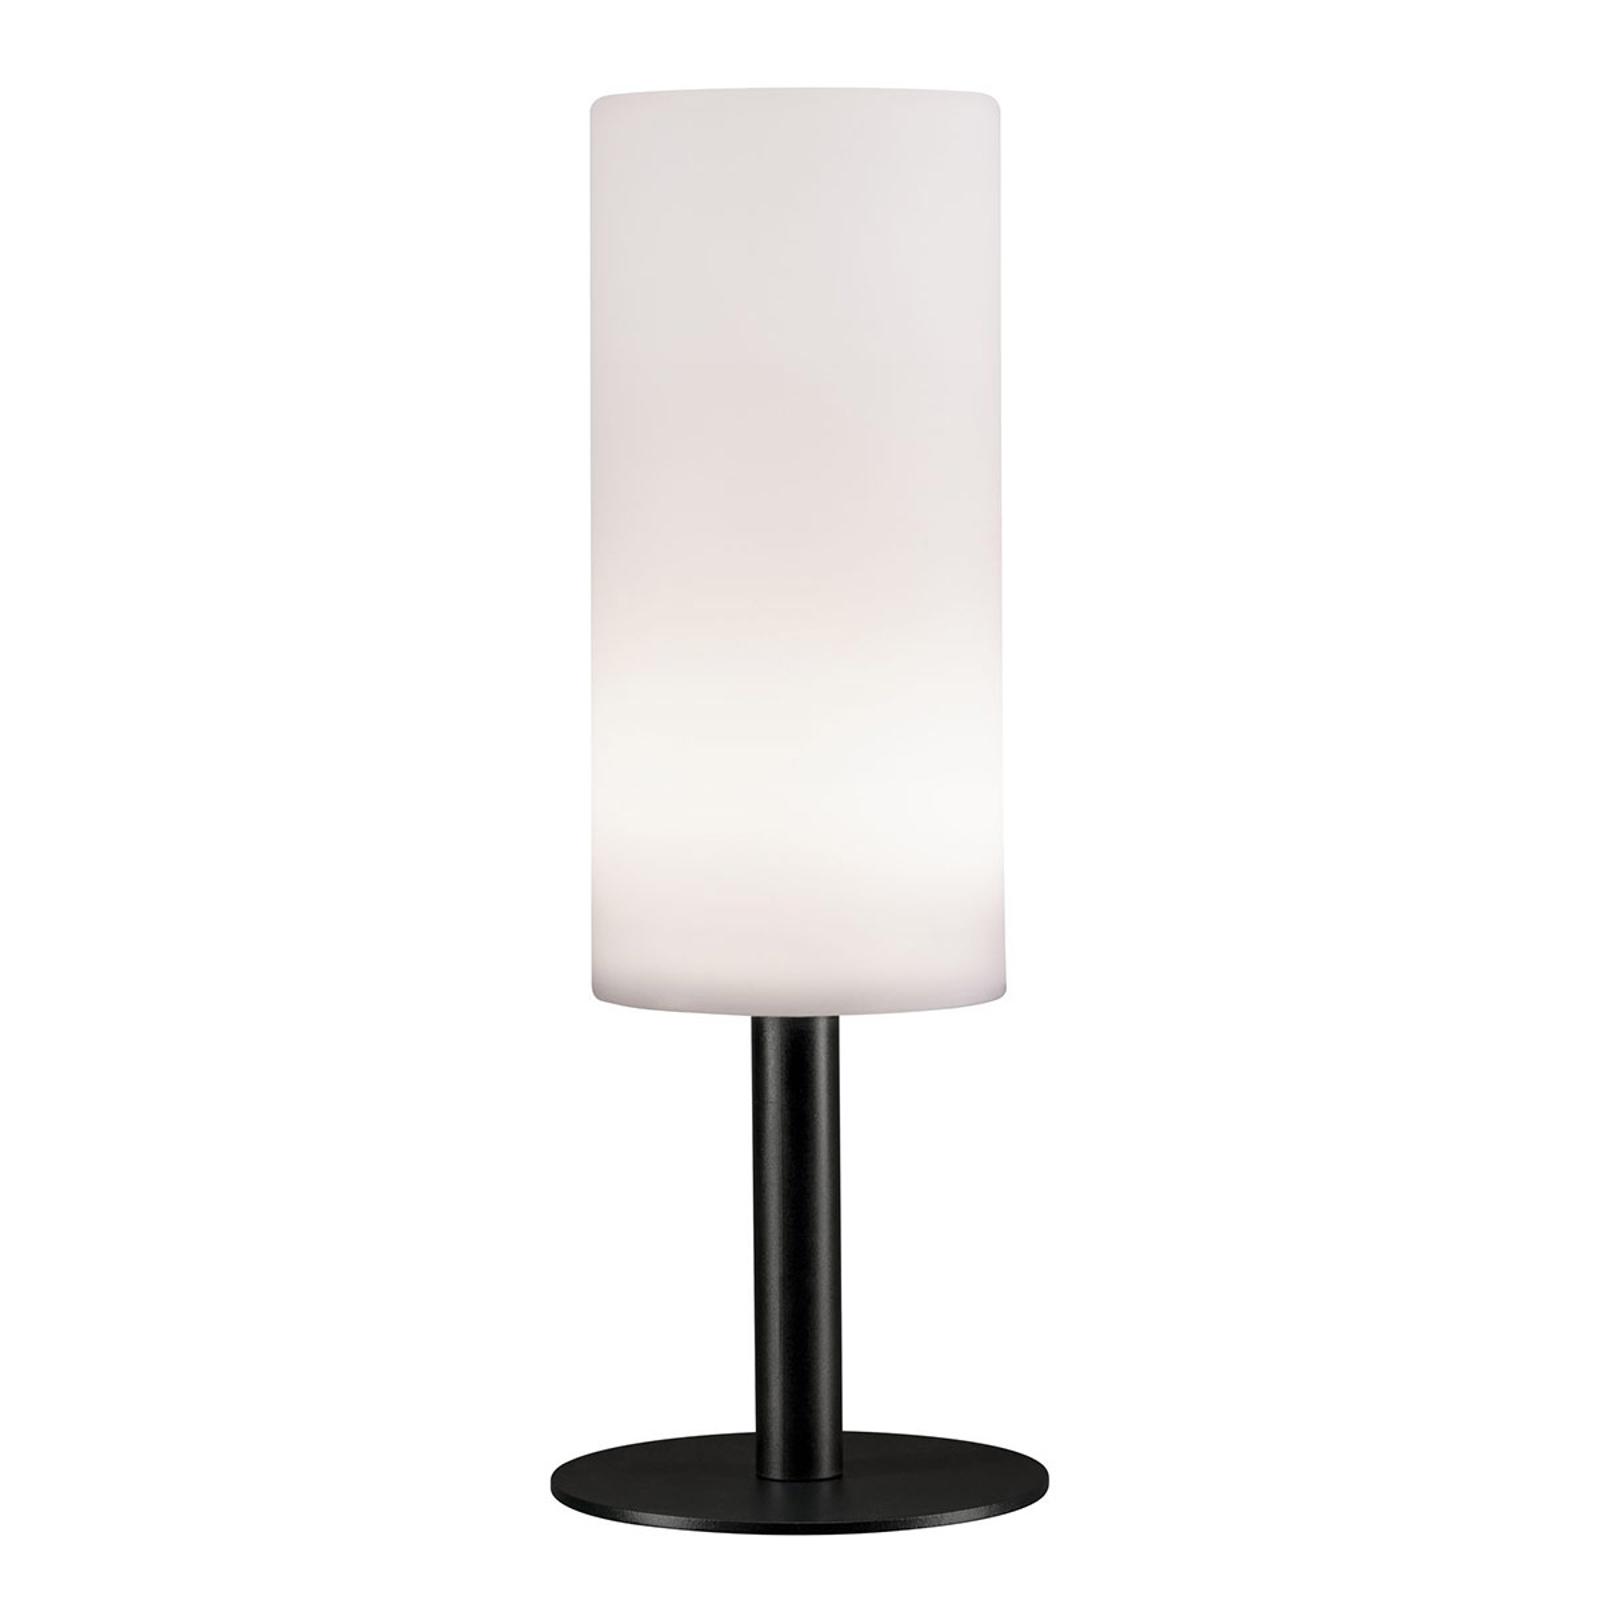 Paulmann Mobile Pipe lampada da tavolo a batteria